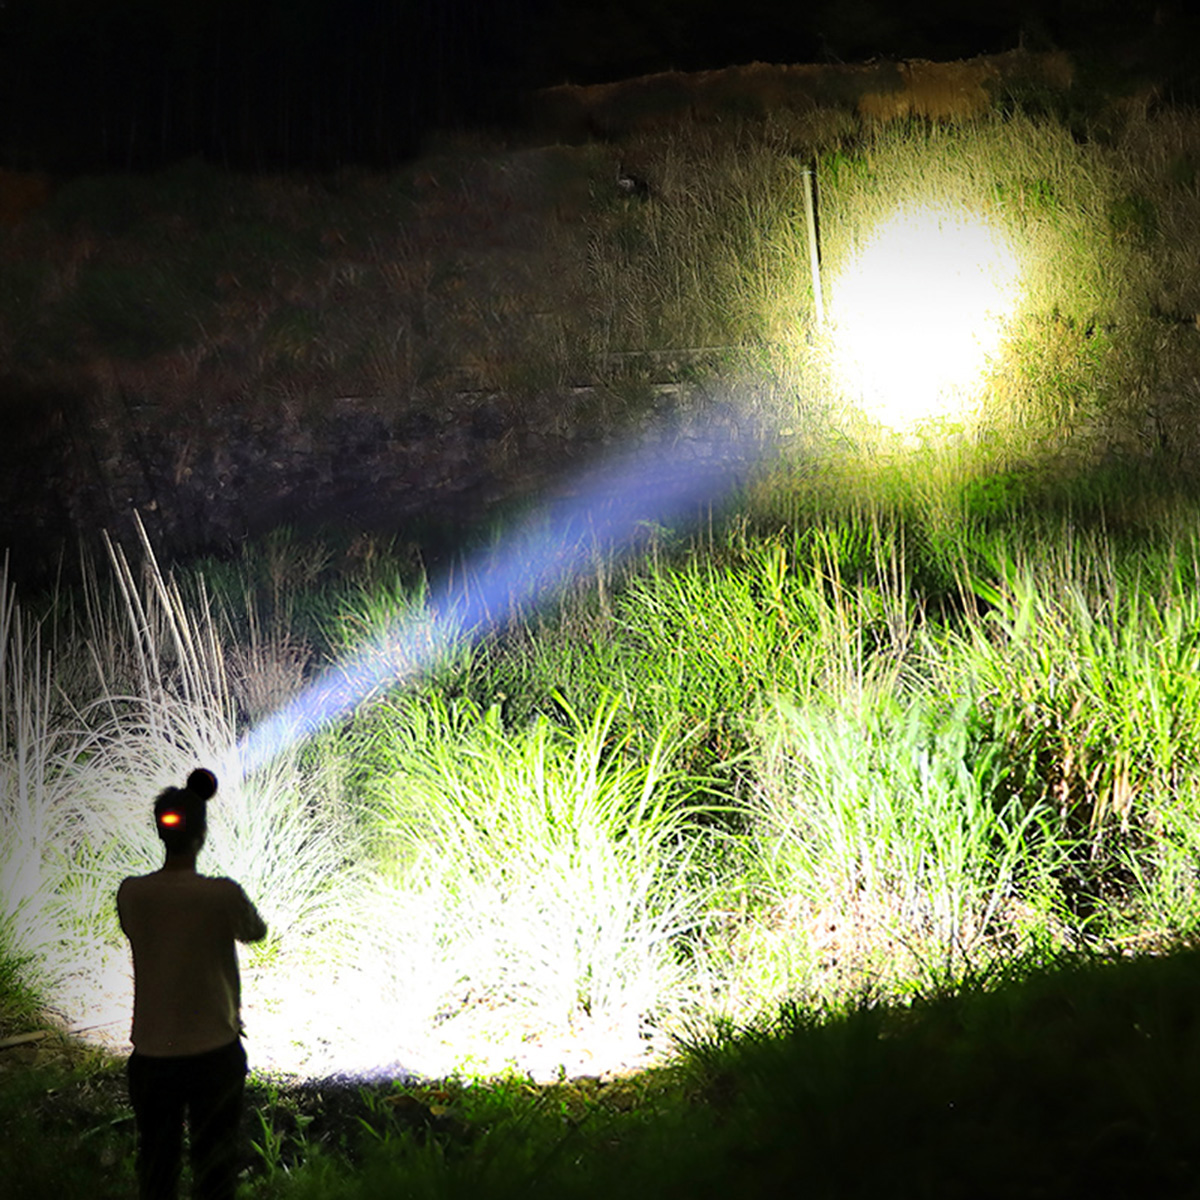 Head Lamp Led Recharge Led Flashlight High Lumens Xhp70 Headlamp Usb Headlight 18650 Fishing Head Torch Lantern Lampe Frontale